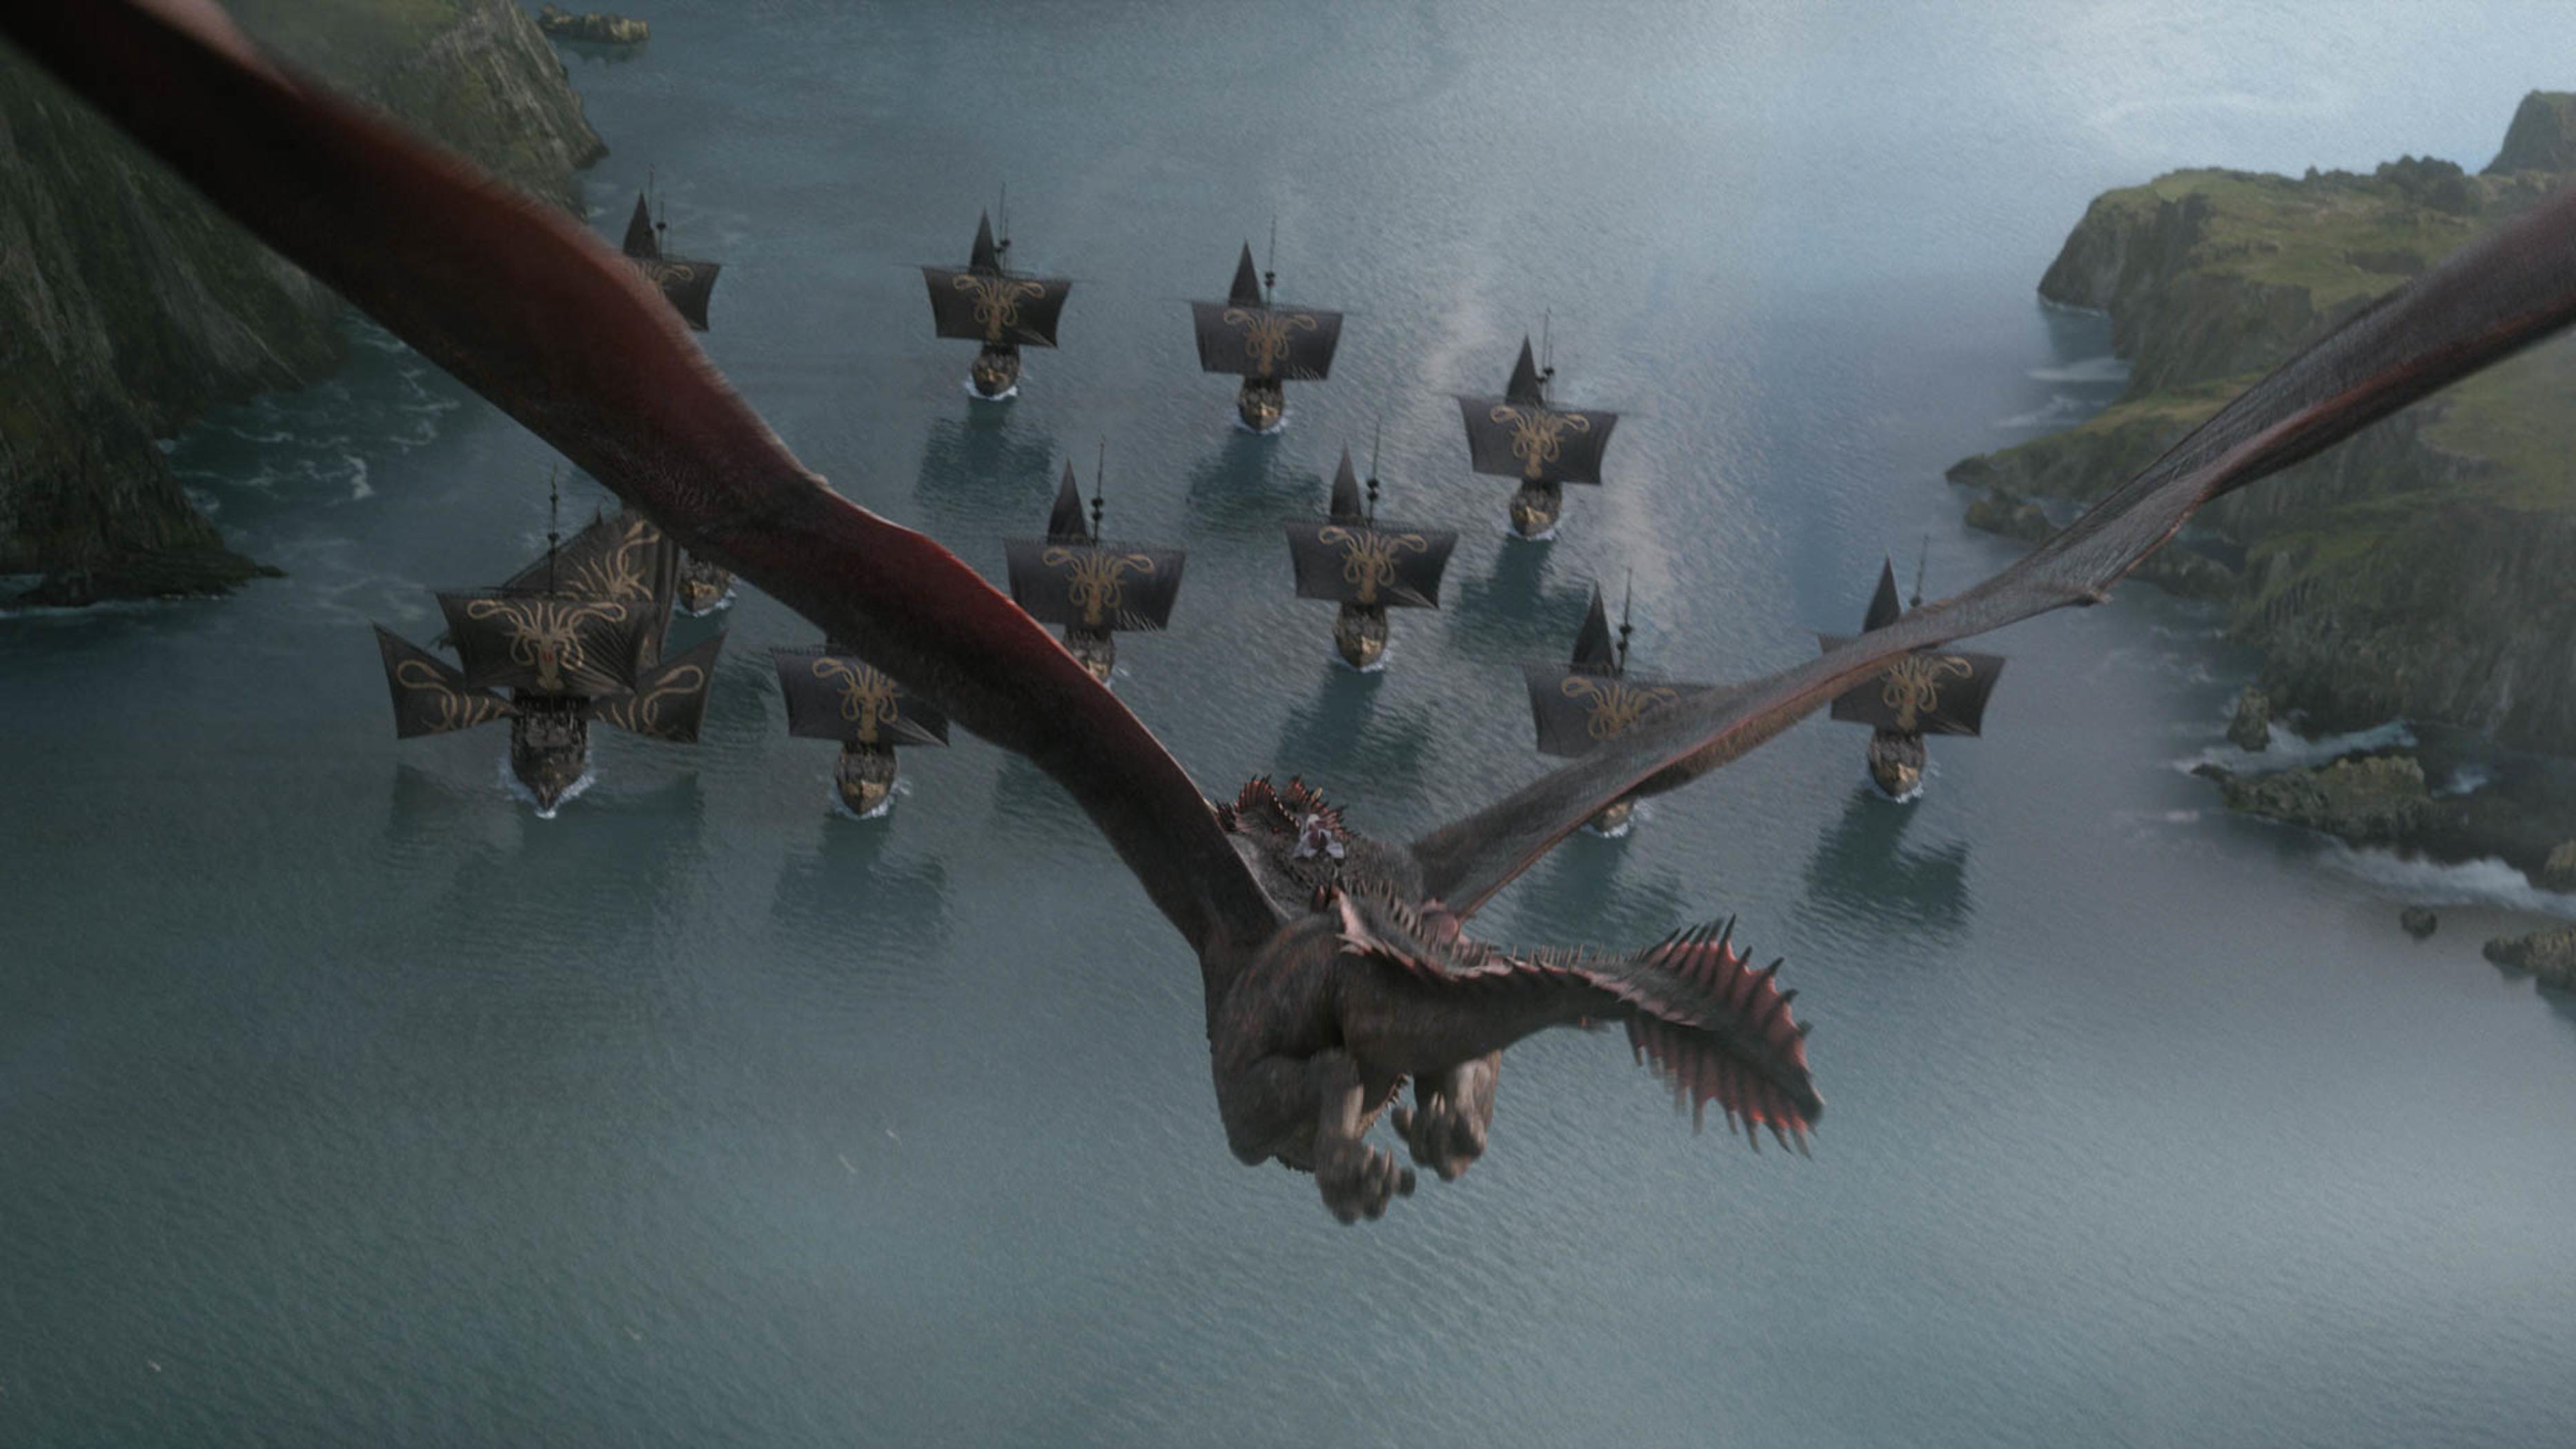 Battle at Dragonstone